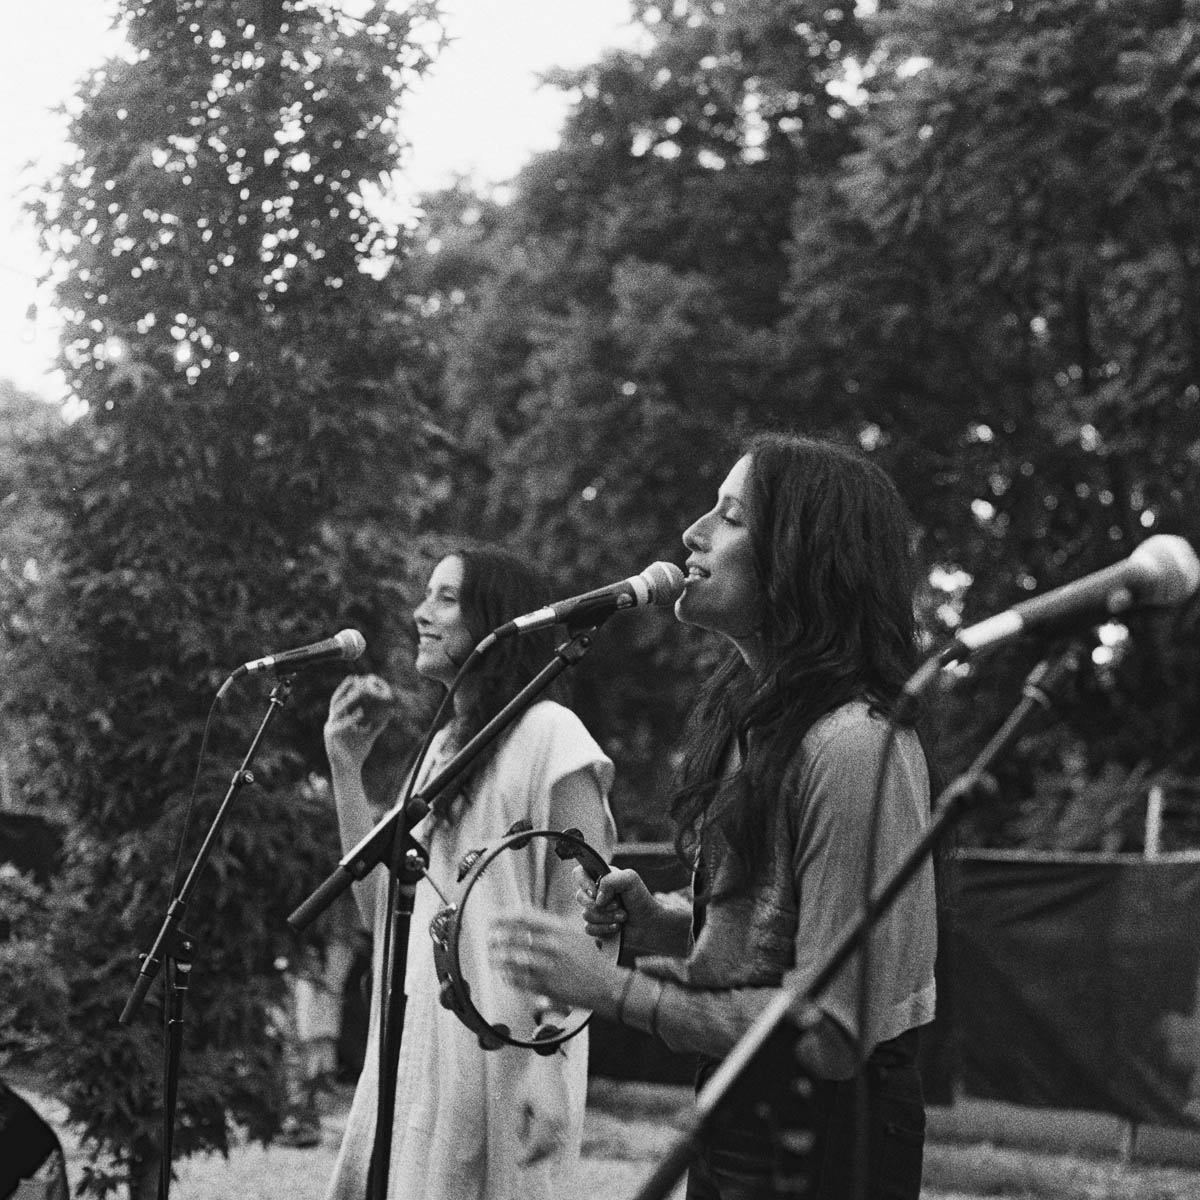 nashville black and white film event photographer documentary ©2015abigailbobophotography0010.jpg